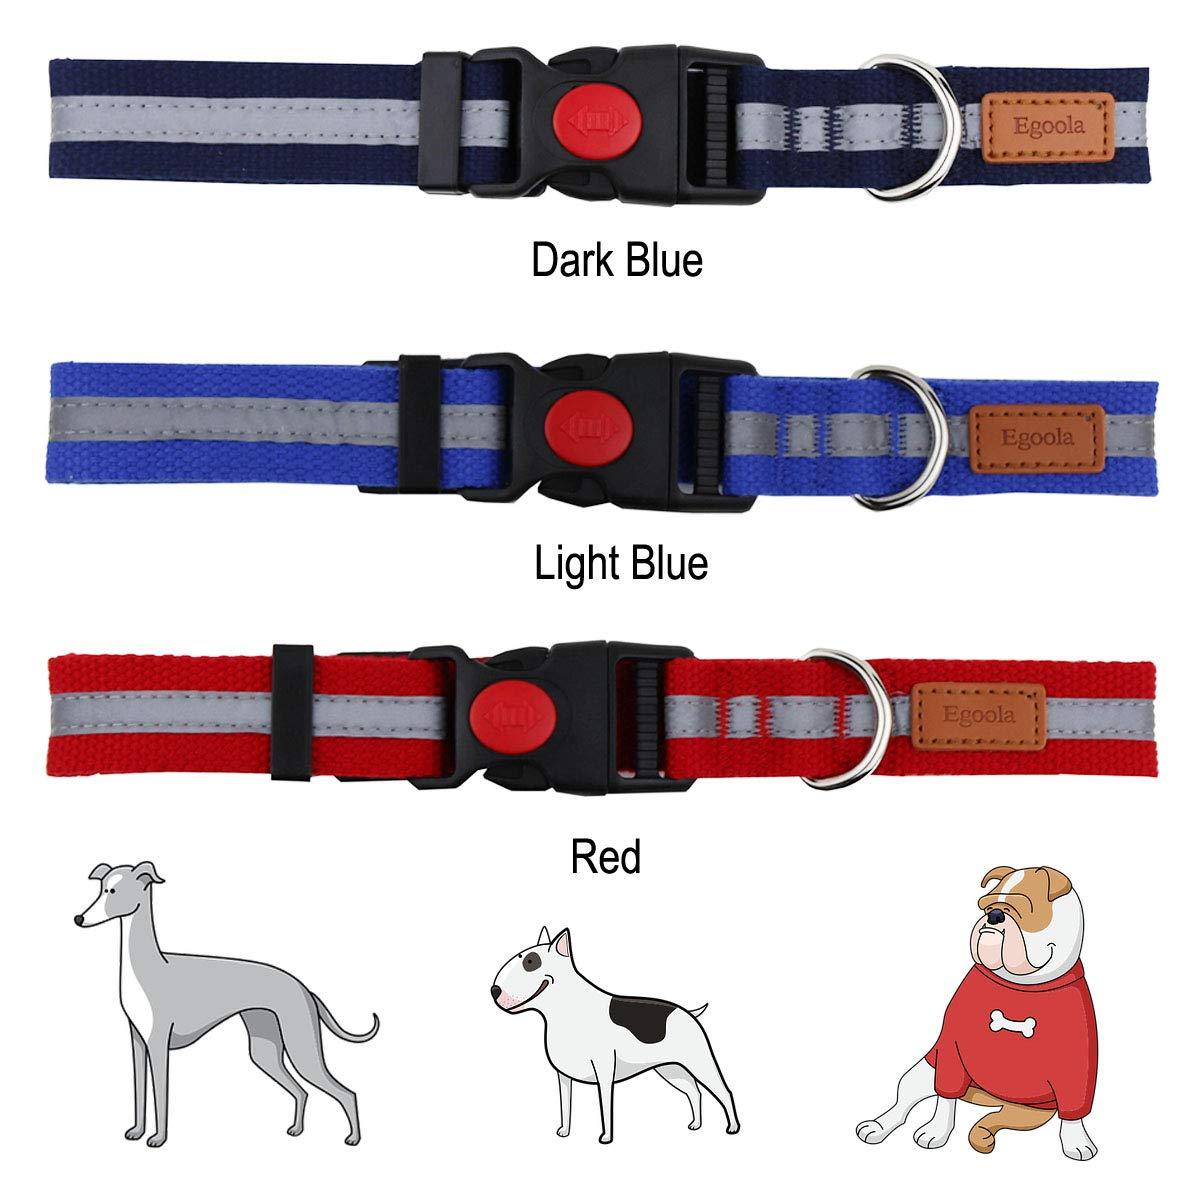 Egoola Night Reflective Dog Collar Adjustable Pet Collars with Small Medium Large Dark Blue